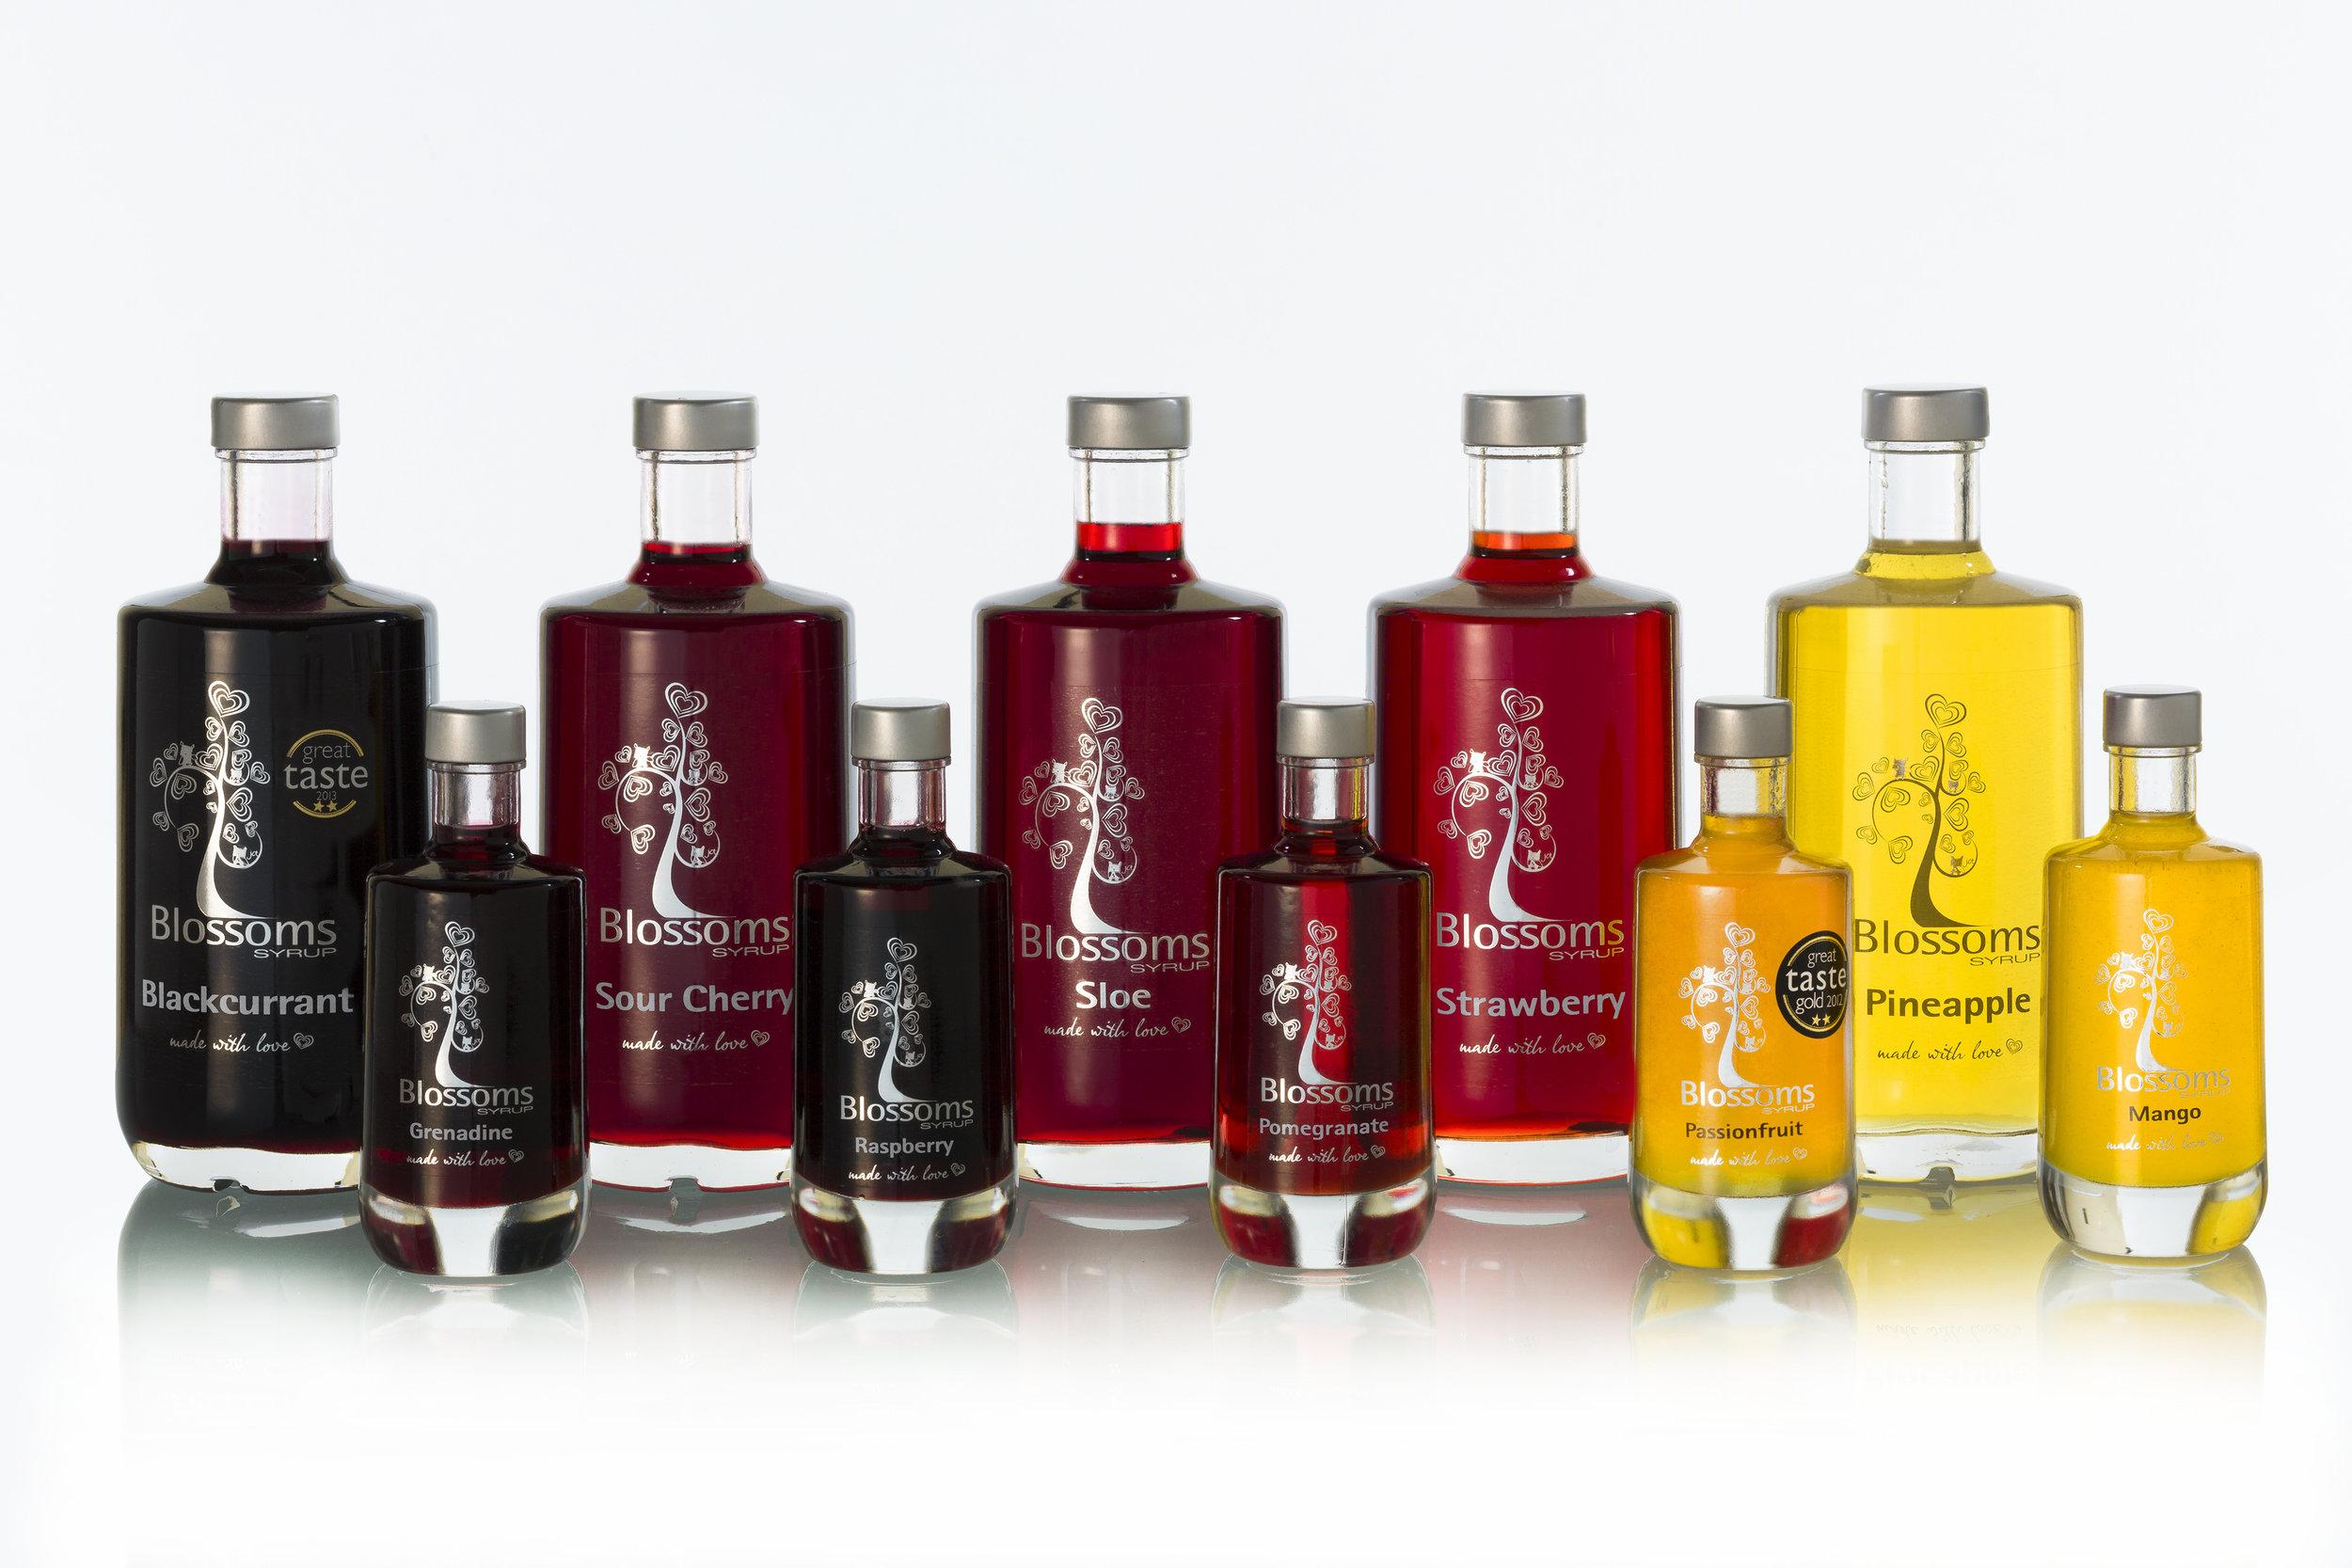 Blossoms Syrup glass bottles range